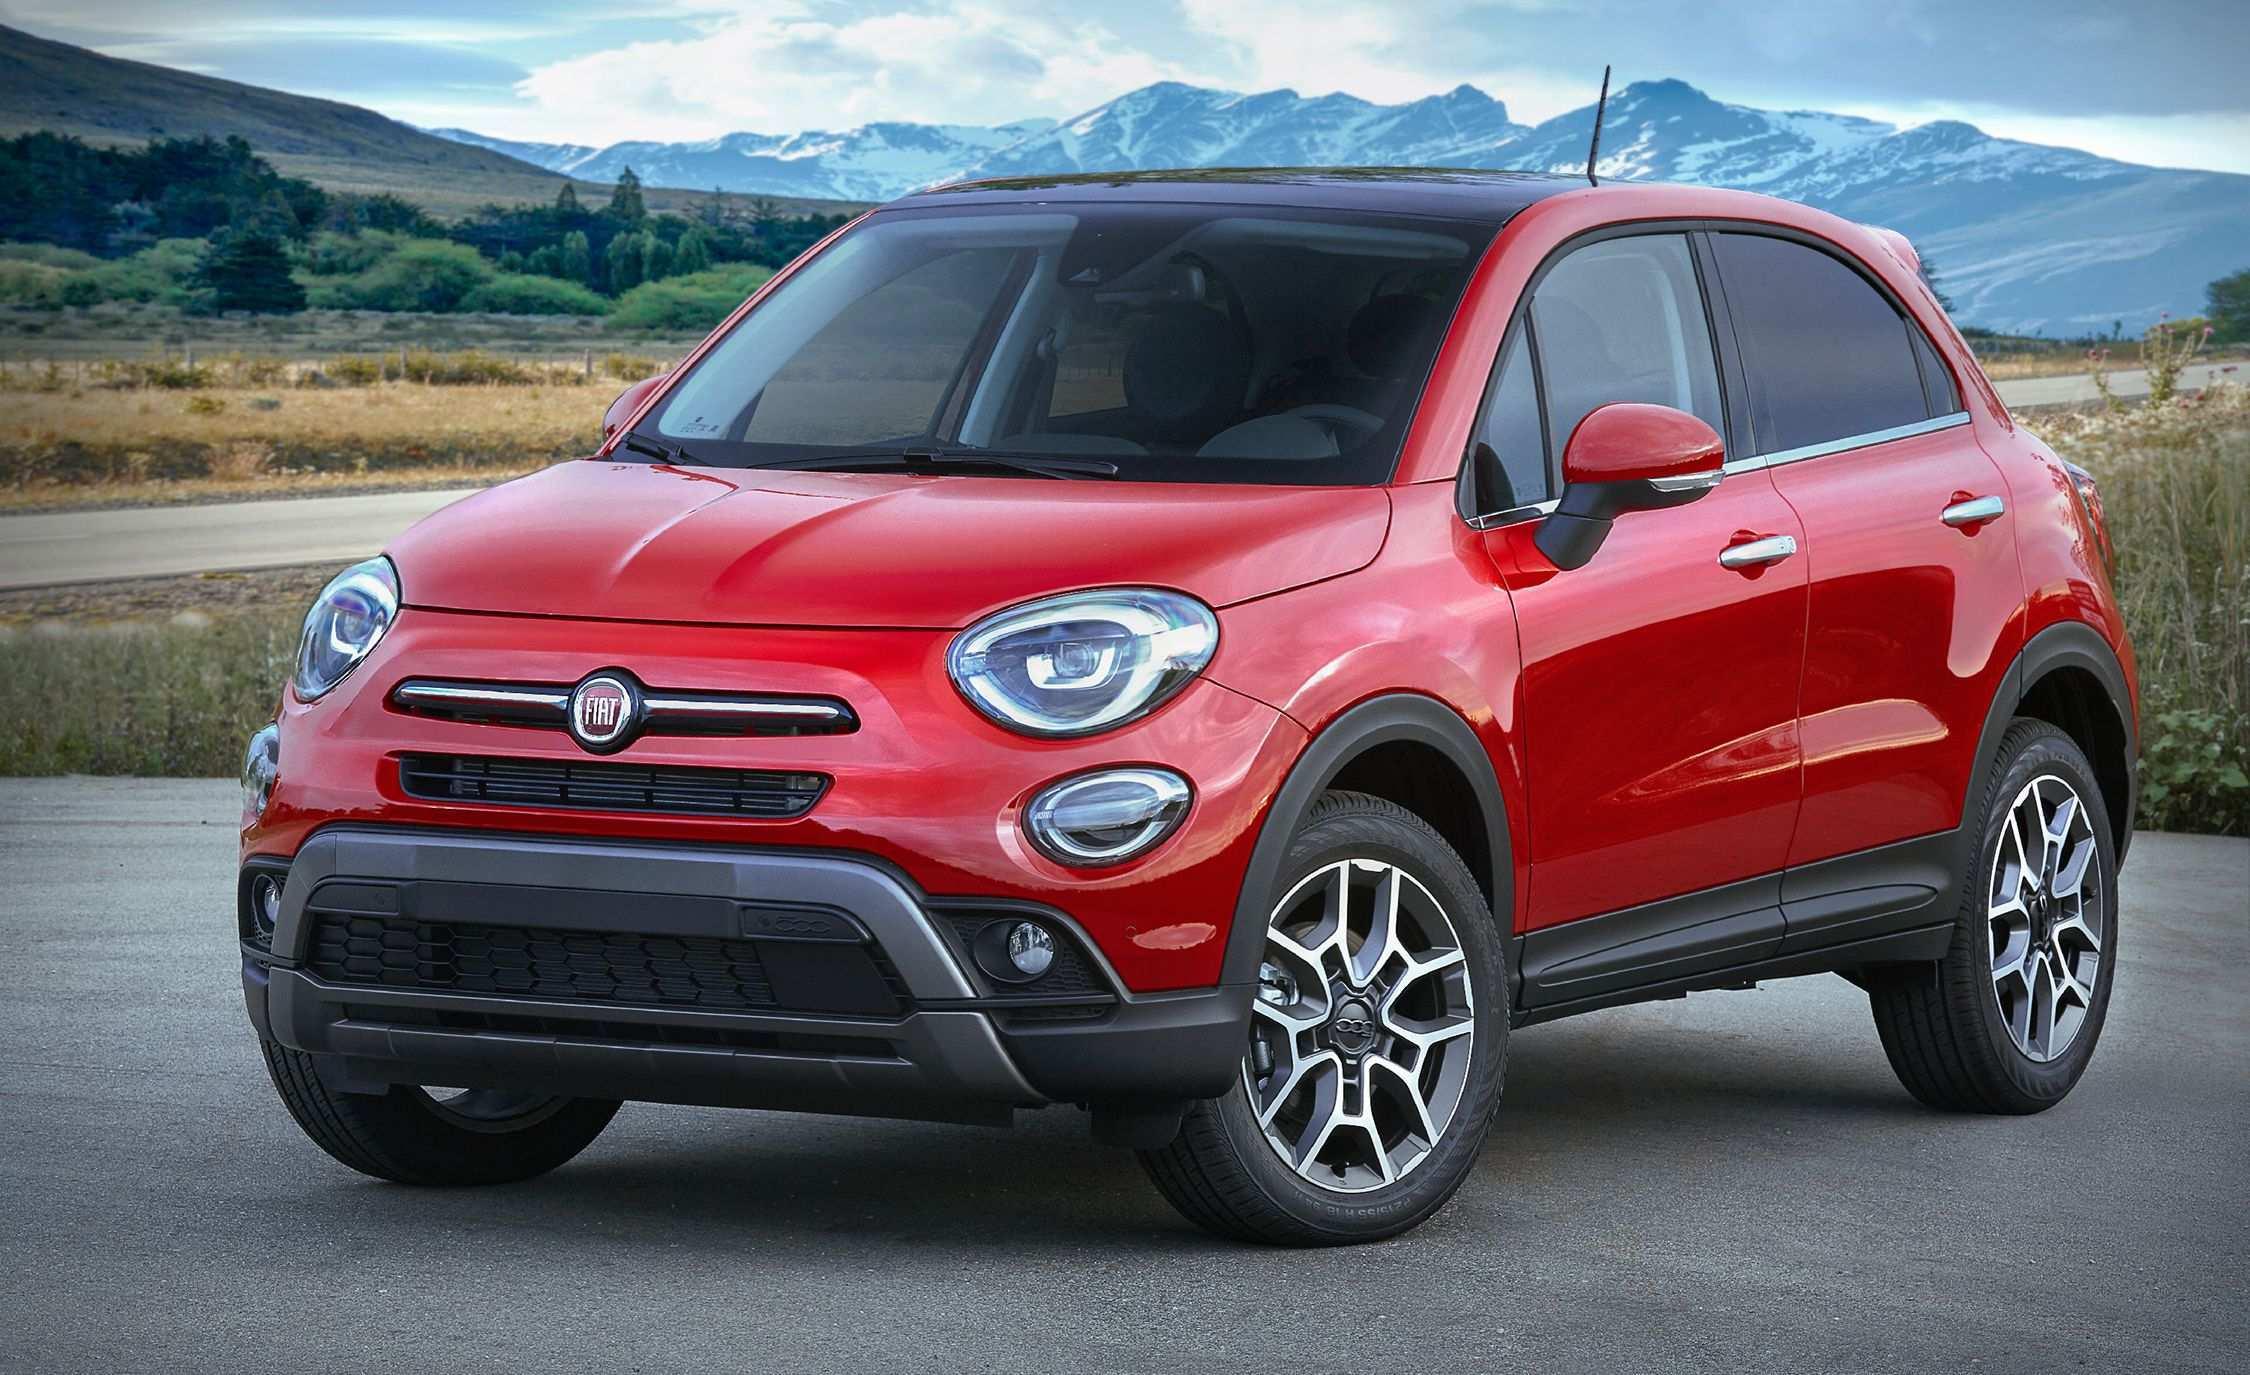 22 New Auto Fiat 2020 Prices with Auto Fiat 2020